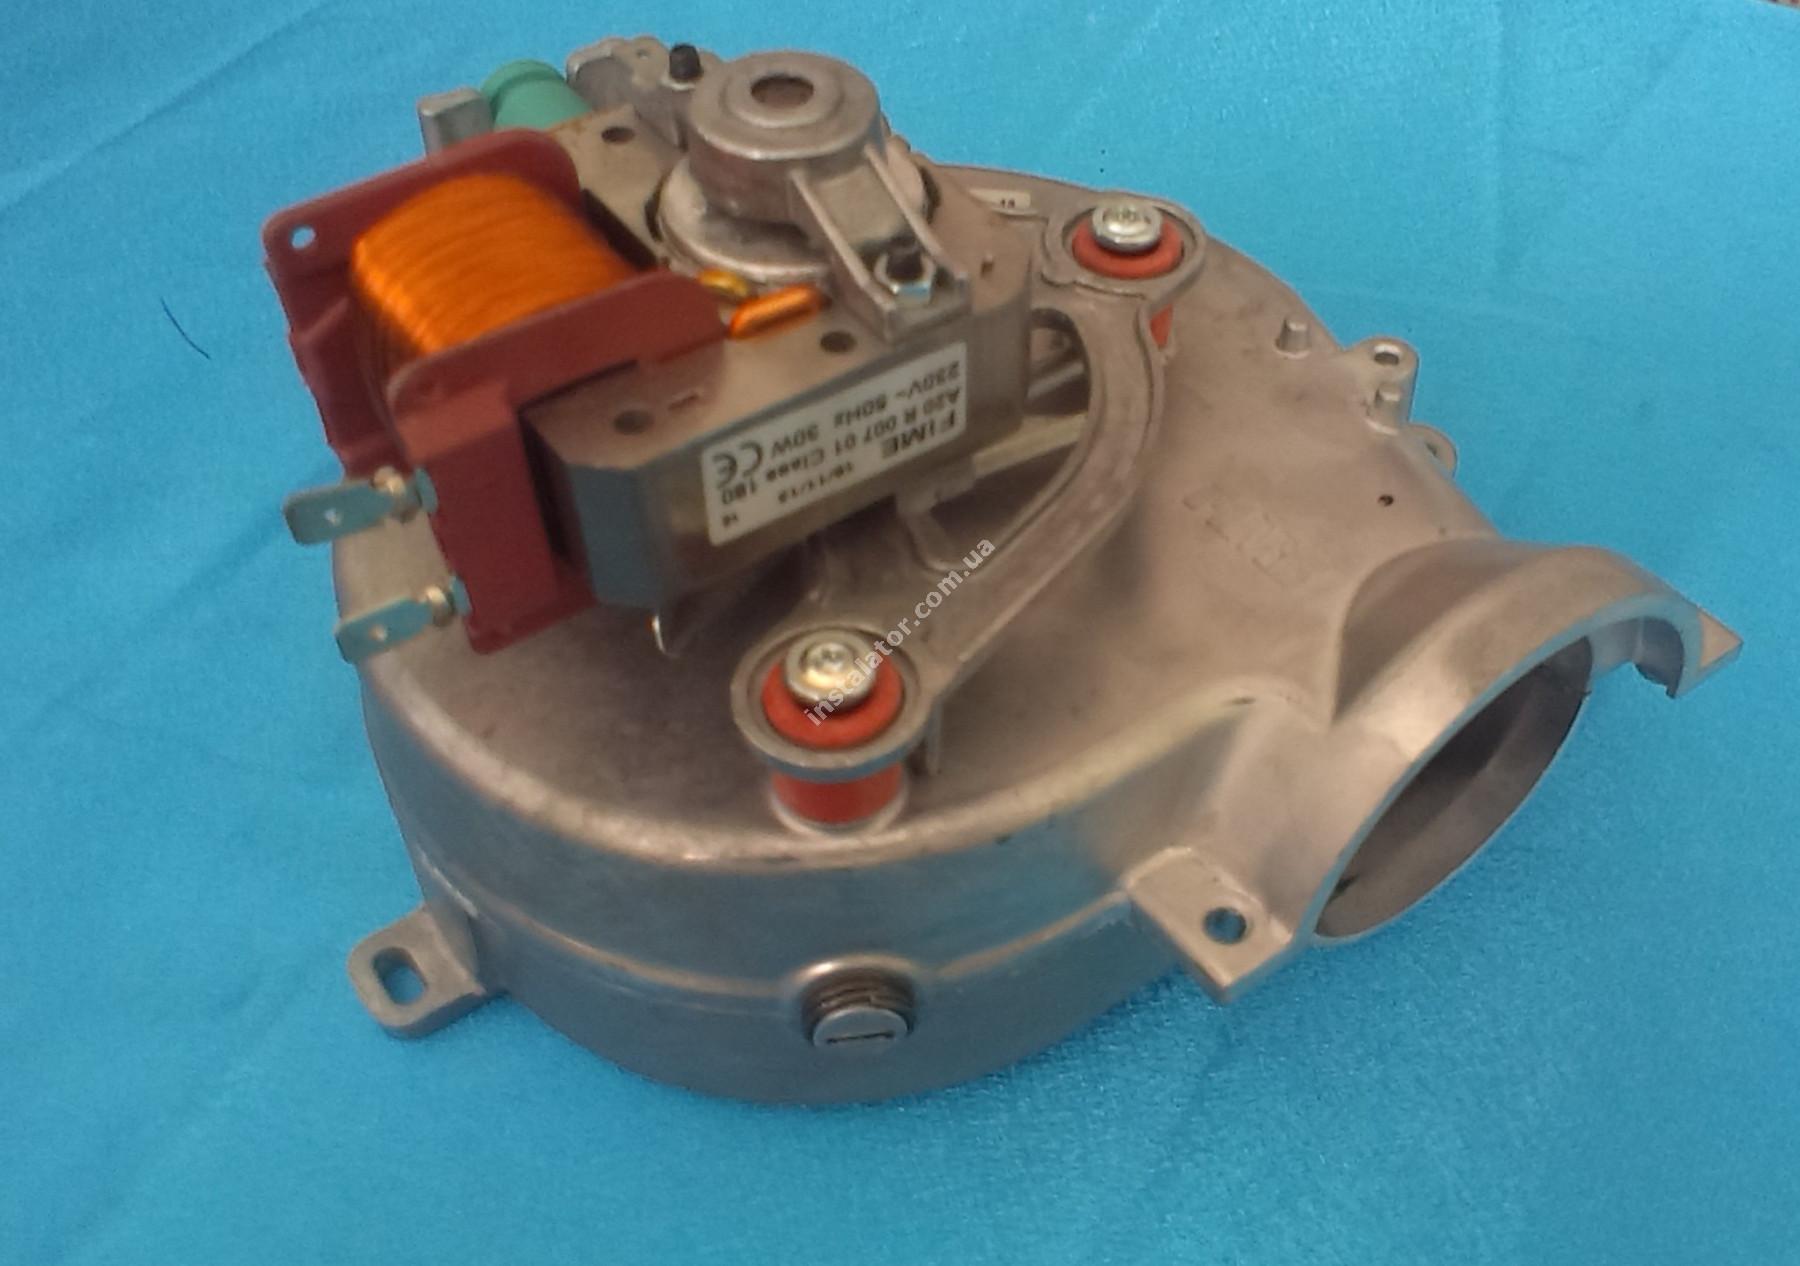 65104357  Турбіна (вентилятор) ARISTON EGIS, AS, BS, CLAS, CLAS SYSTEM full-image-1